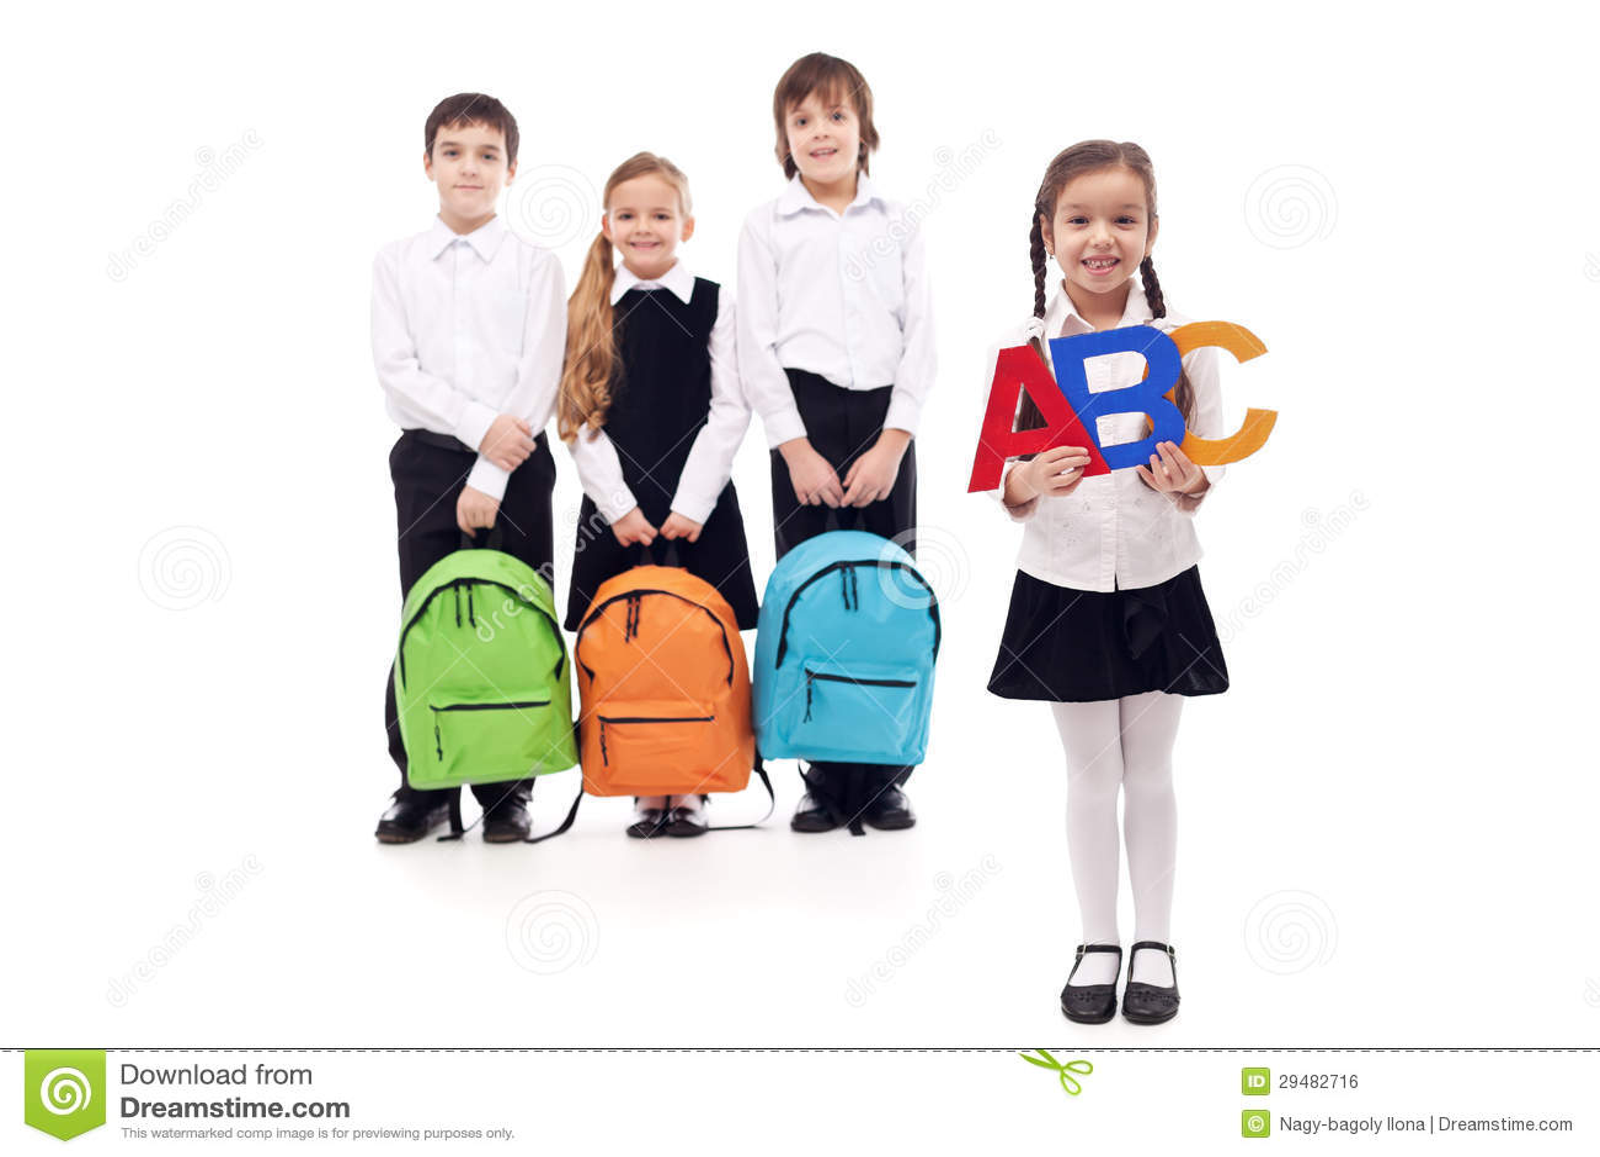 Fun Educational Games for Kids - JumpStart